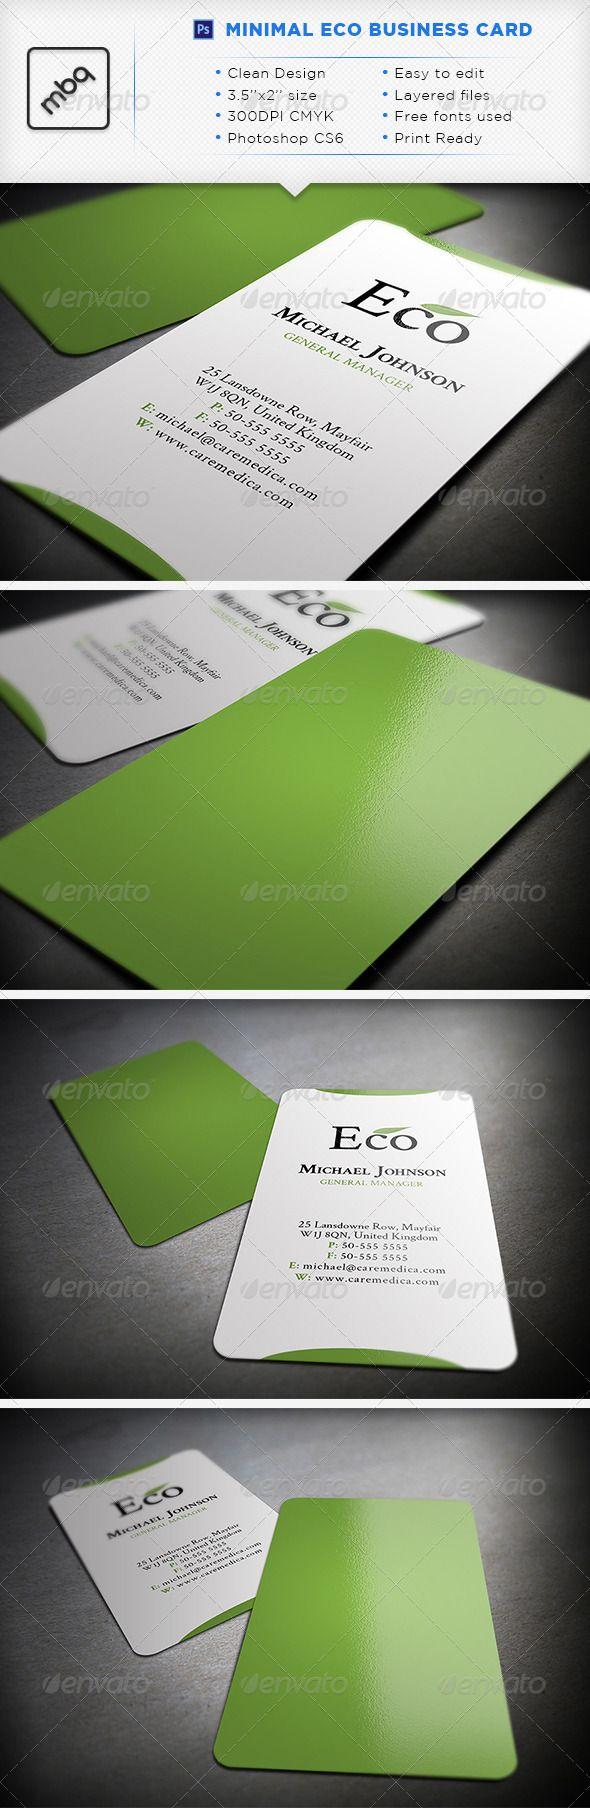 83 best Business Card Design images on Pinterest | Business cards ...